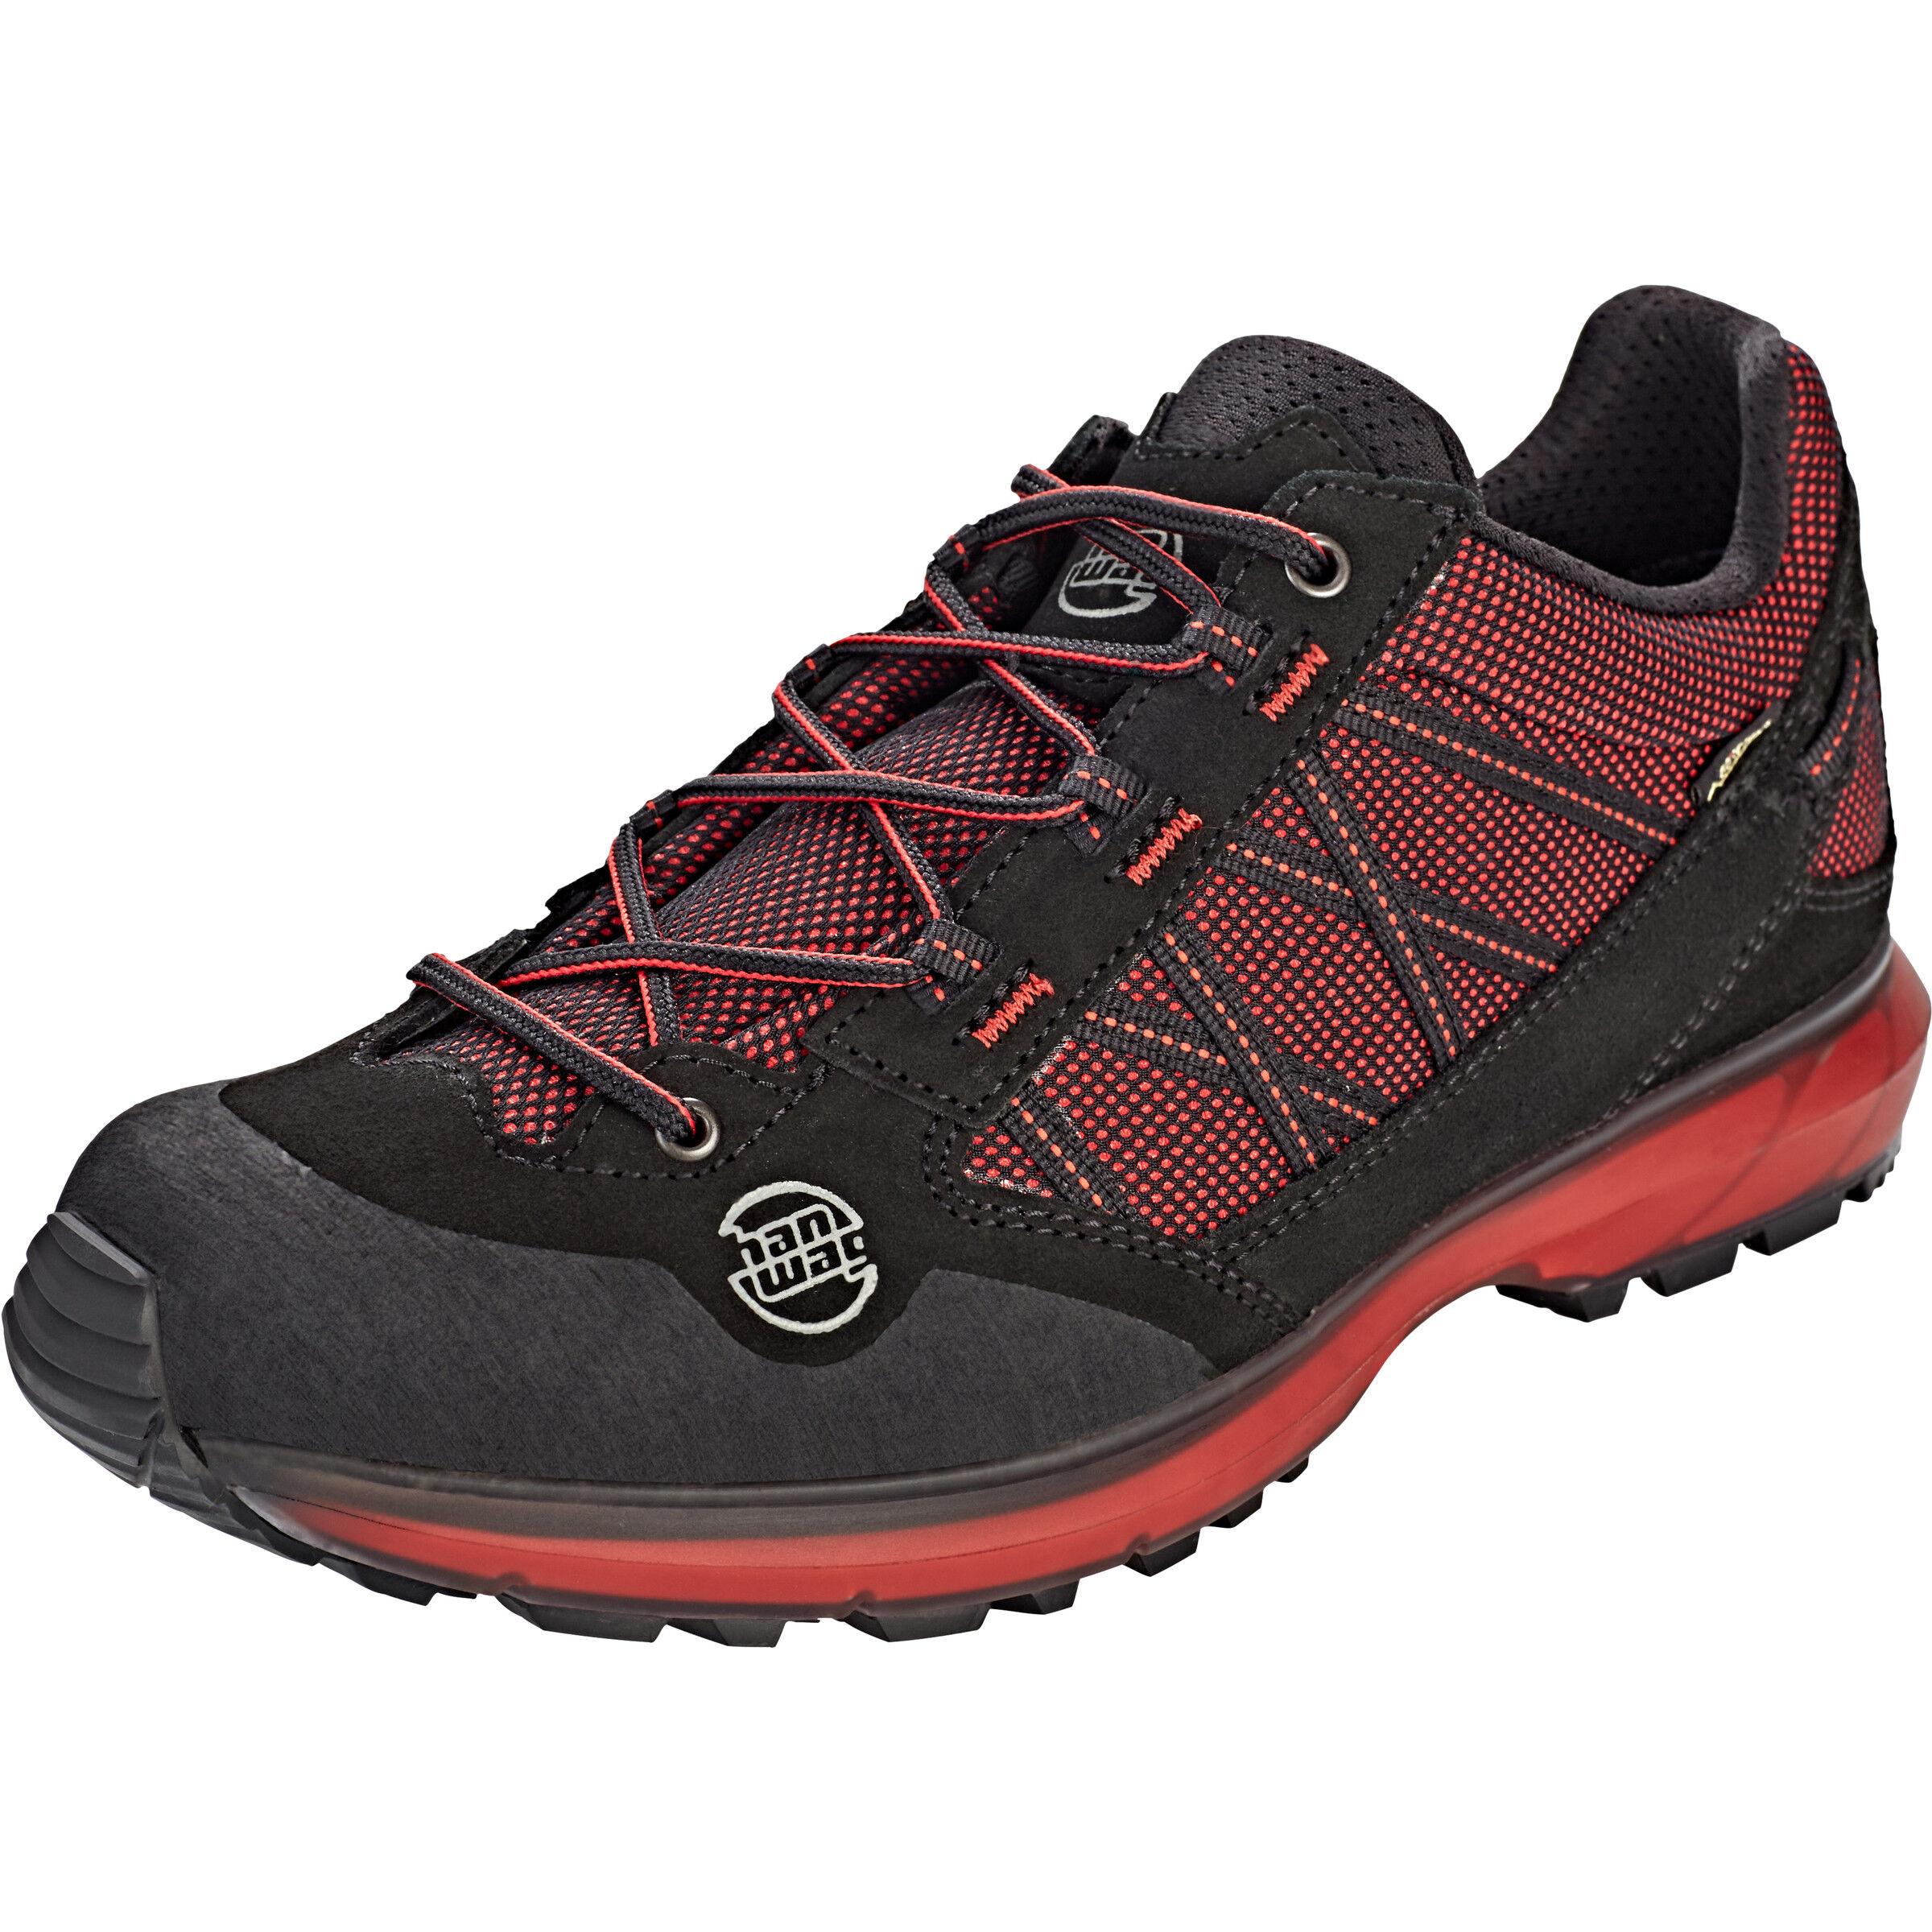 Hanwag Belorado II Tubetec GTX Shoes Herren blackred